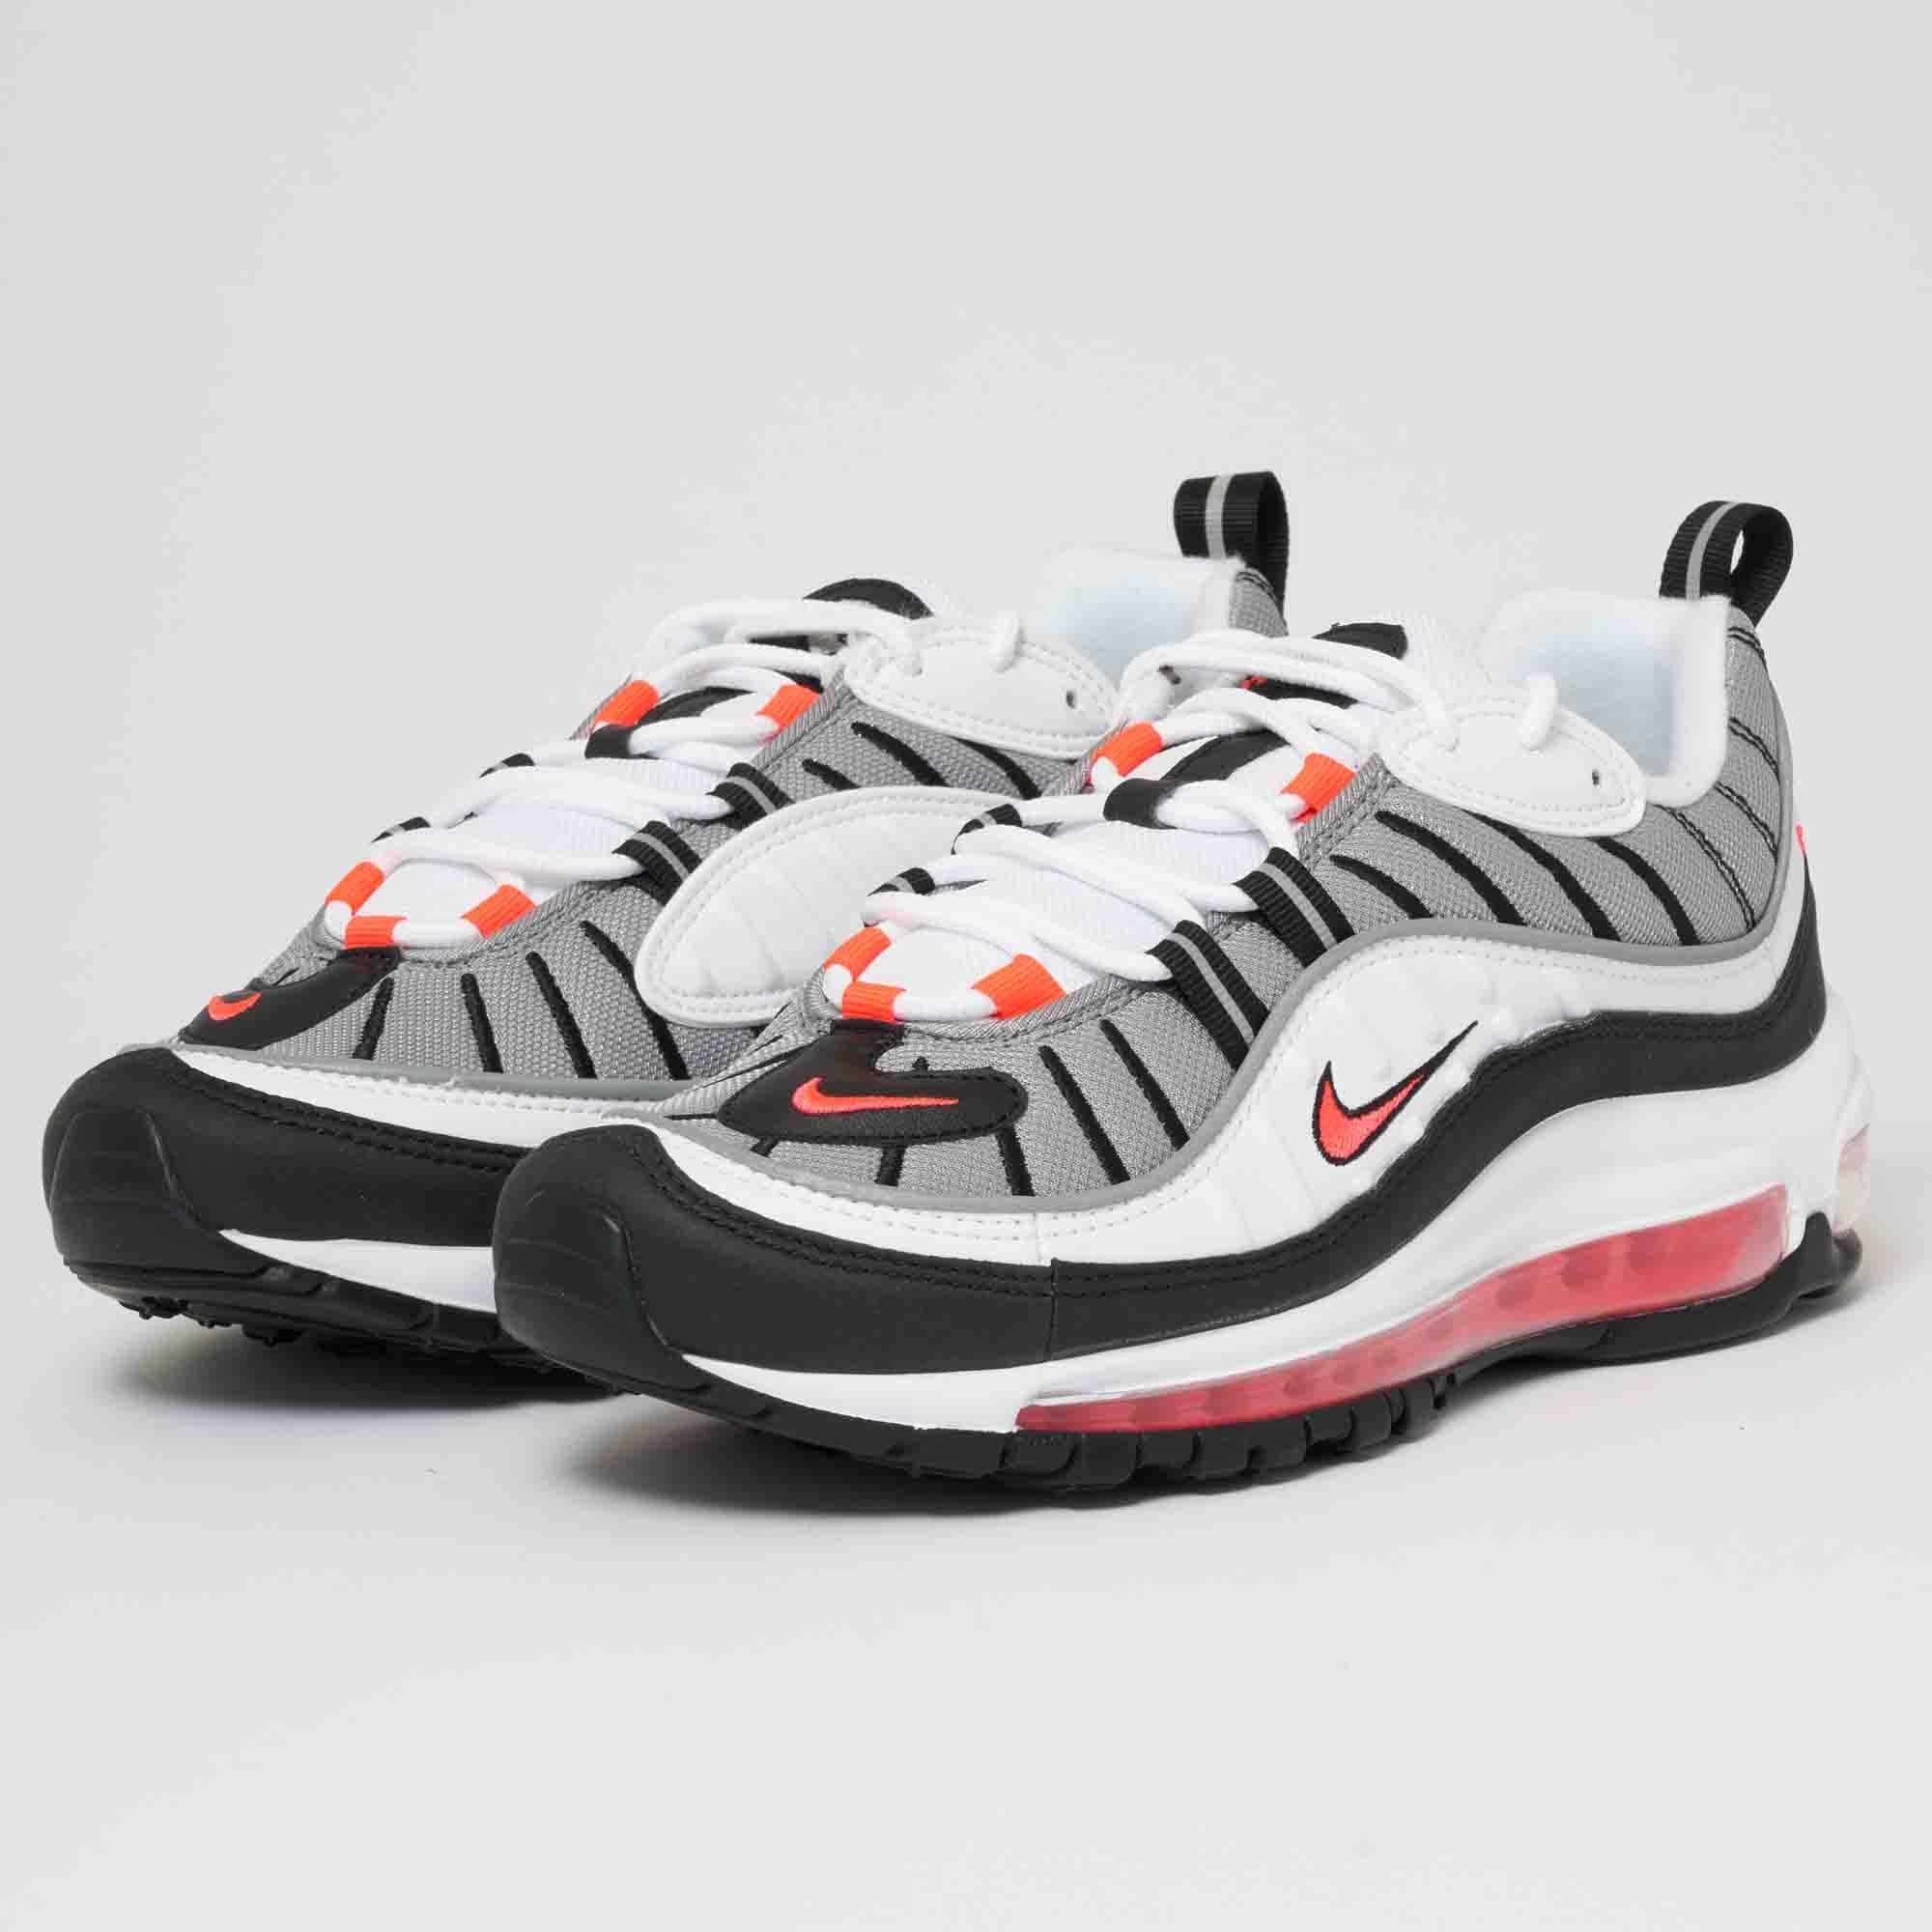 info for e2d05 9eda7 Nike Women's Air Max 98 - Solar Red